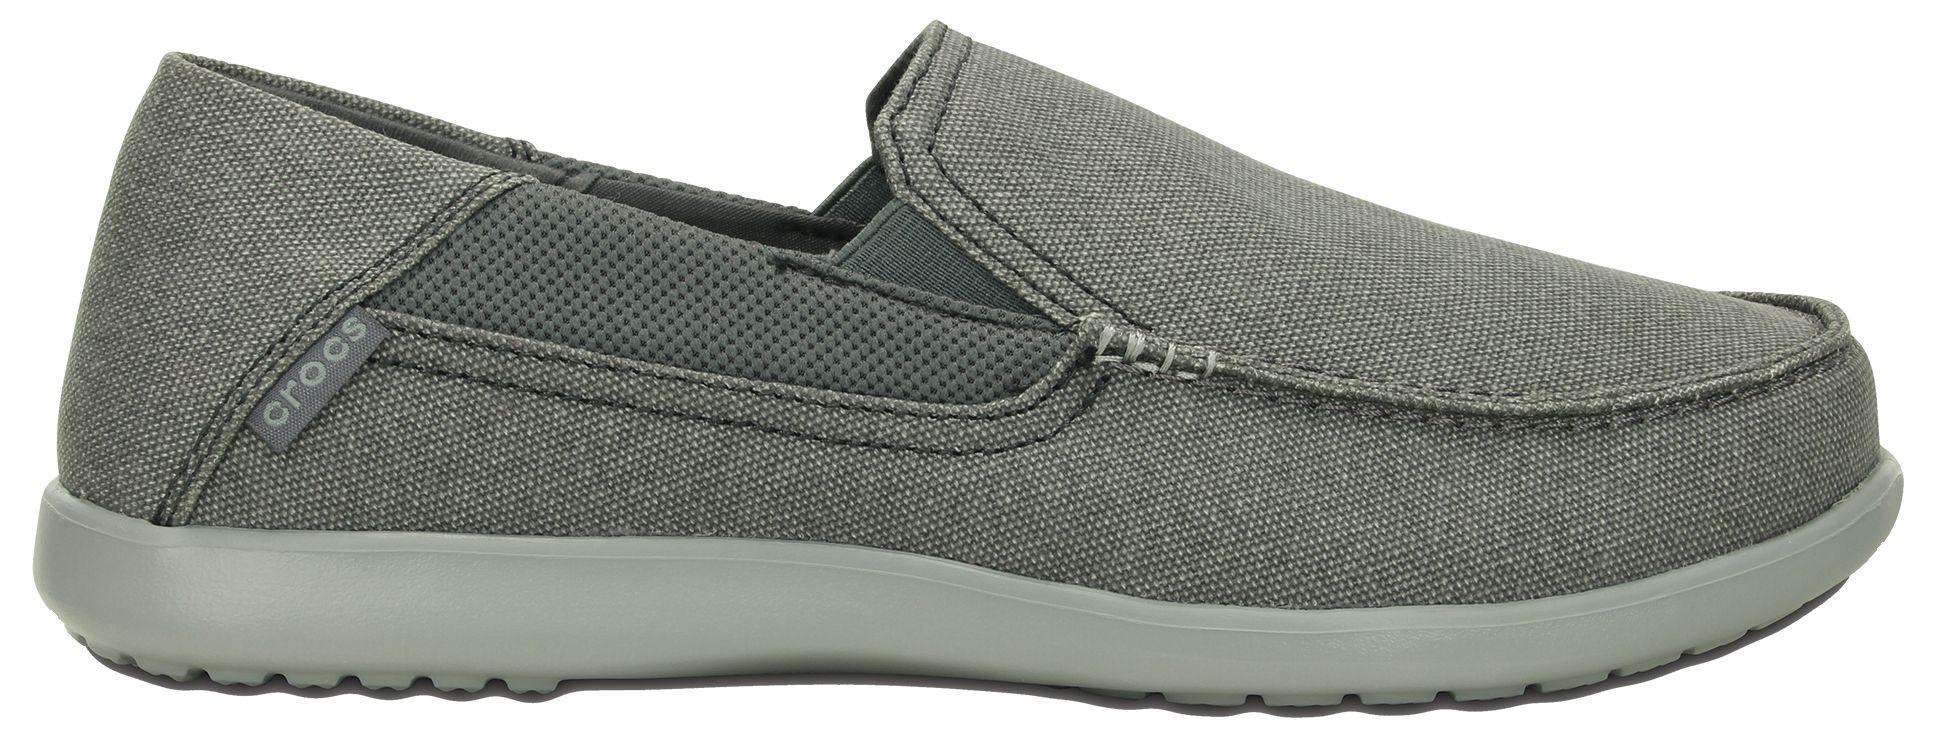 Crocs Men's Santa Cruz 2 Luxe Slip-On Shoes. 0:00. 0:00 / 0:00.  noImageFound ???